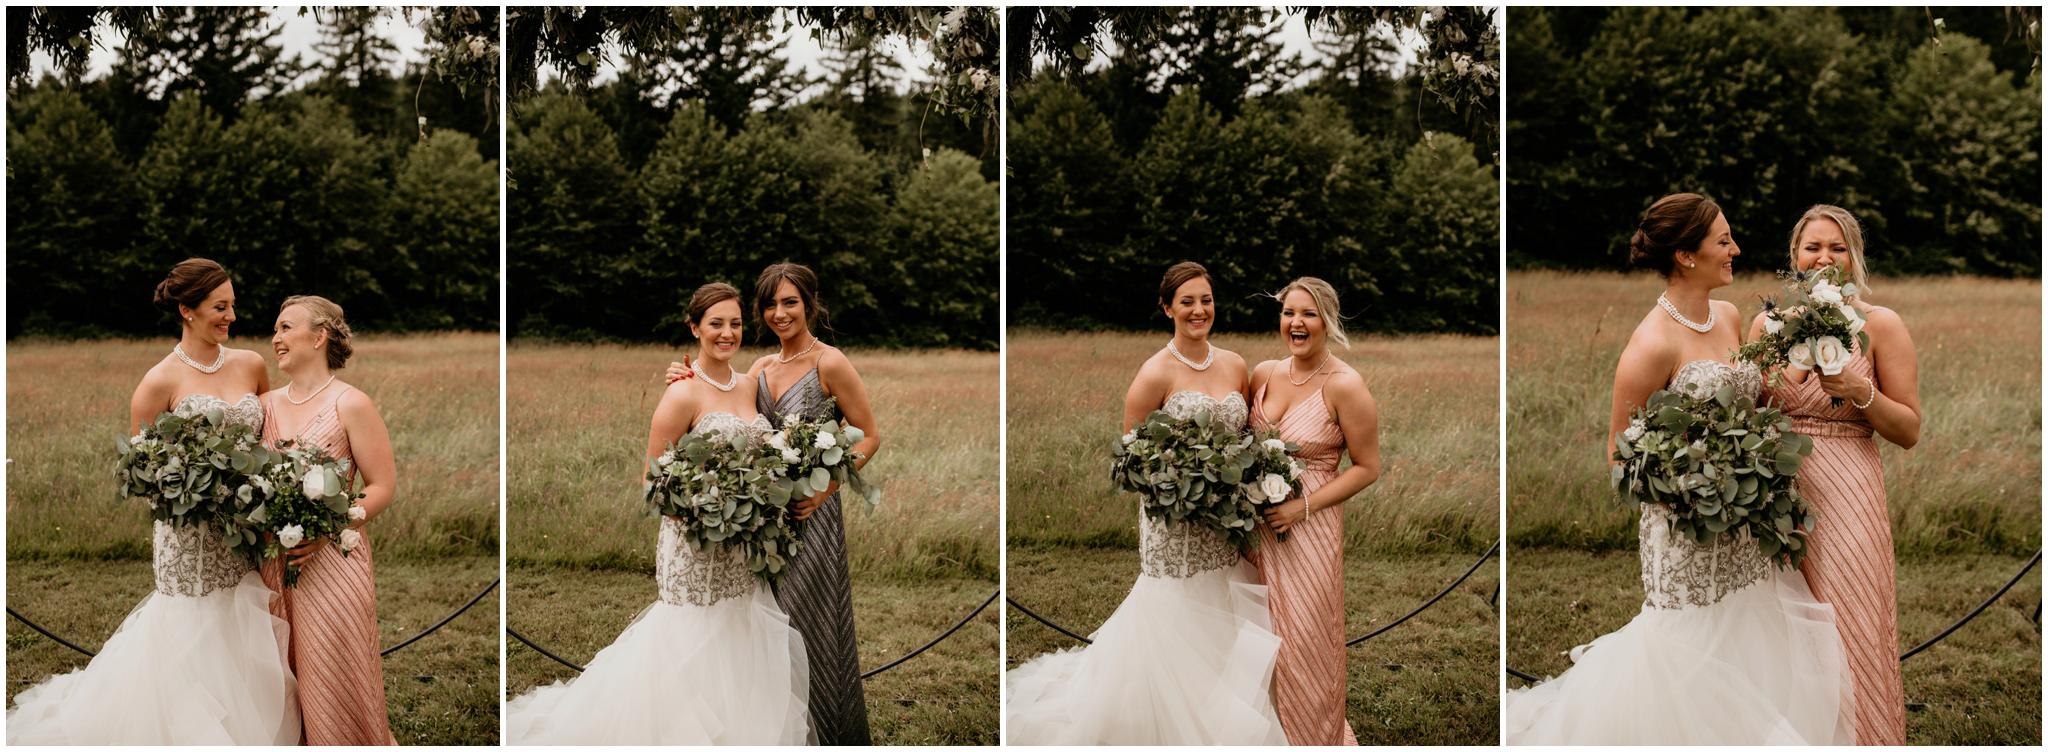 alex-and-matthew-three-cs-farm-venue-seattle-wedding-photographer-067.jpg